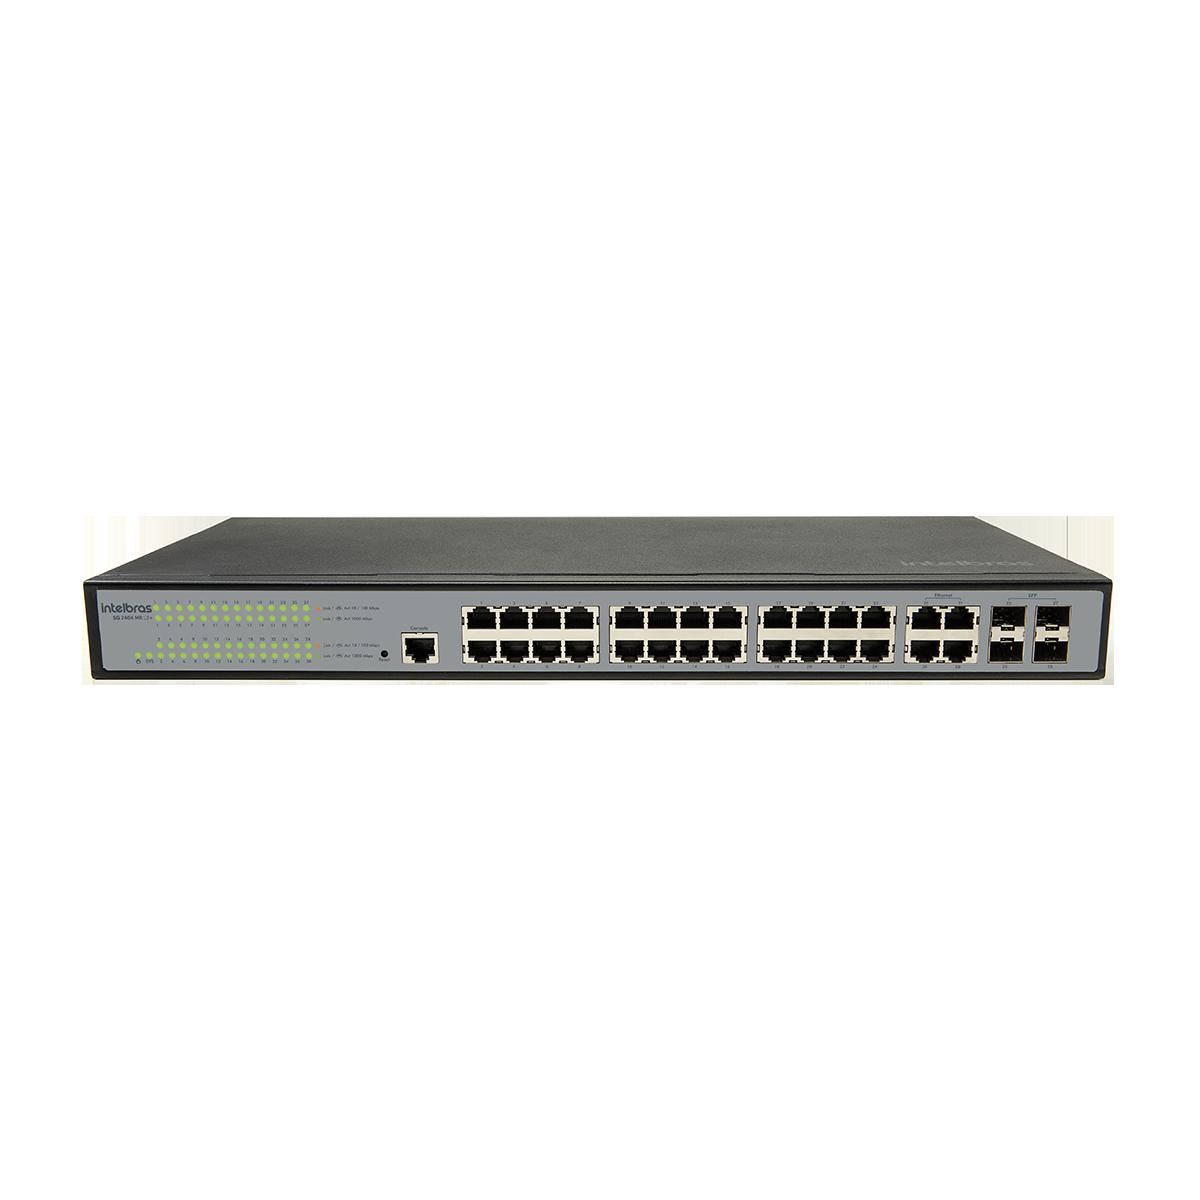 Switch gerenciável 24P Giga + 4P GBIC SG 2404 MR L2+ |Intelbras